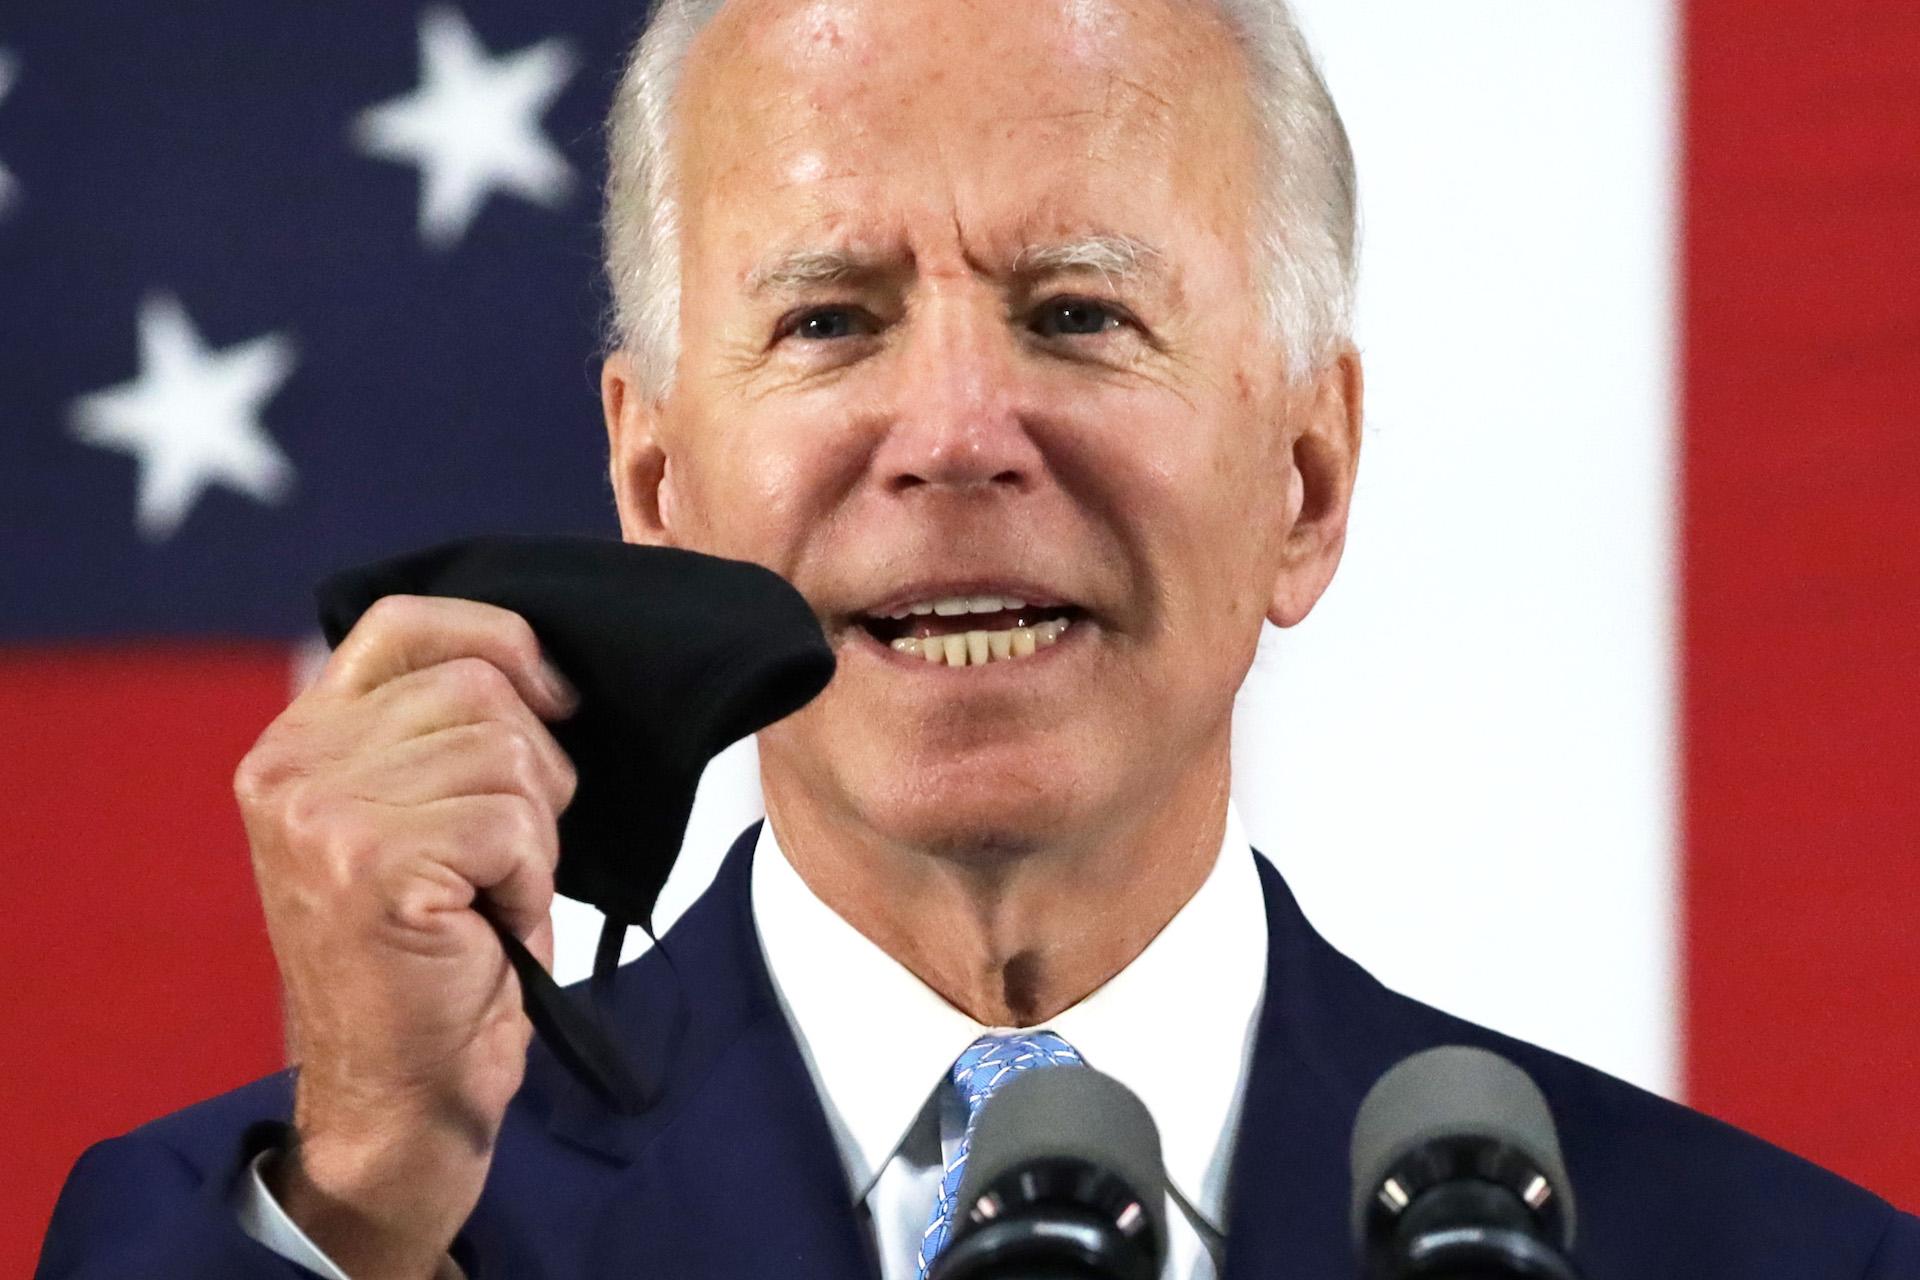 , Joe Biden Says Leave Washington and Columbus Statues Alone, Saubio Making Wealth